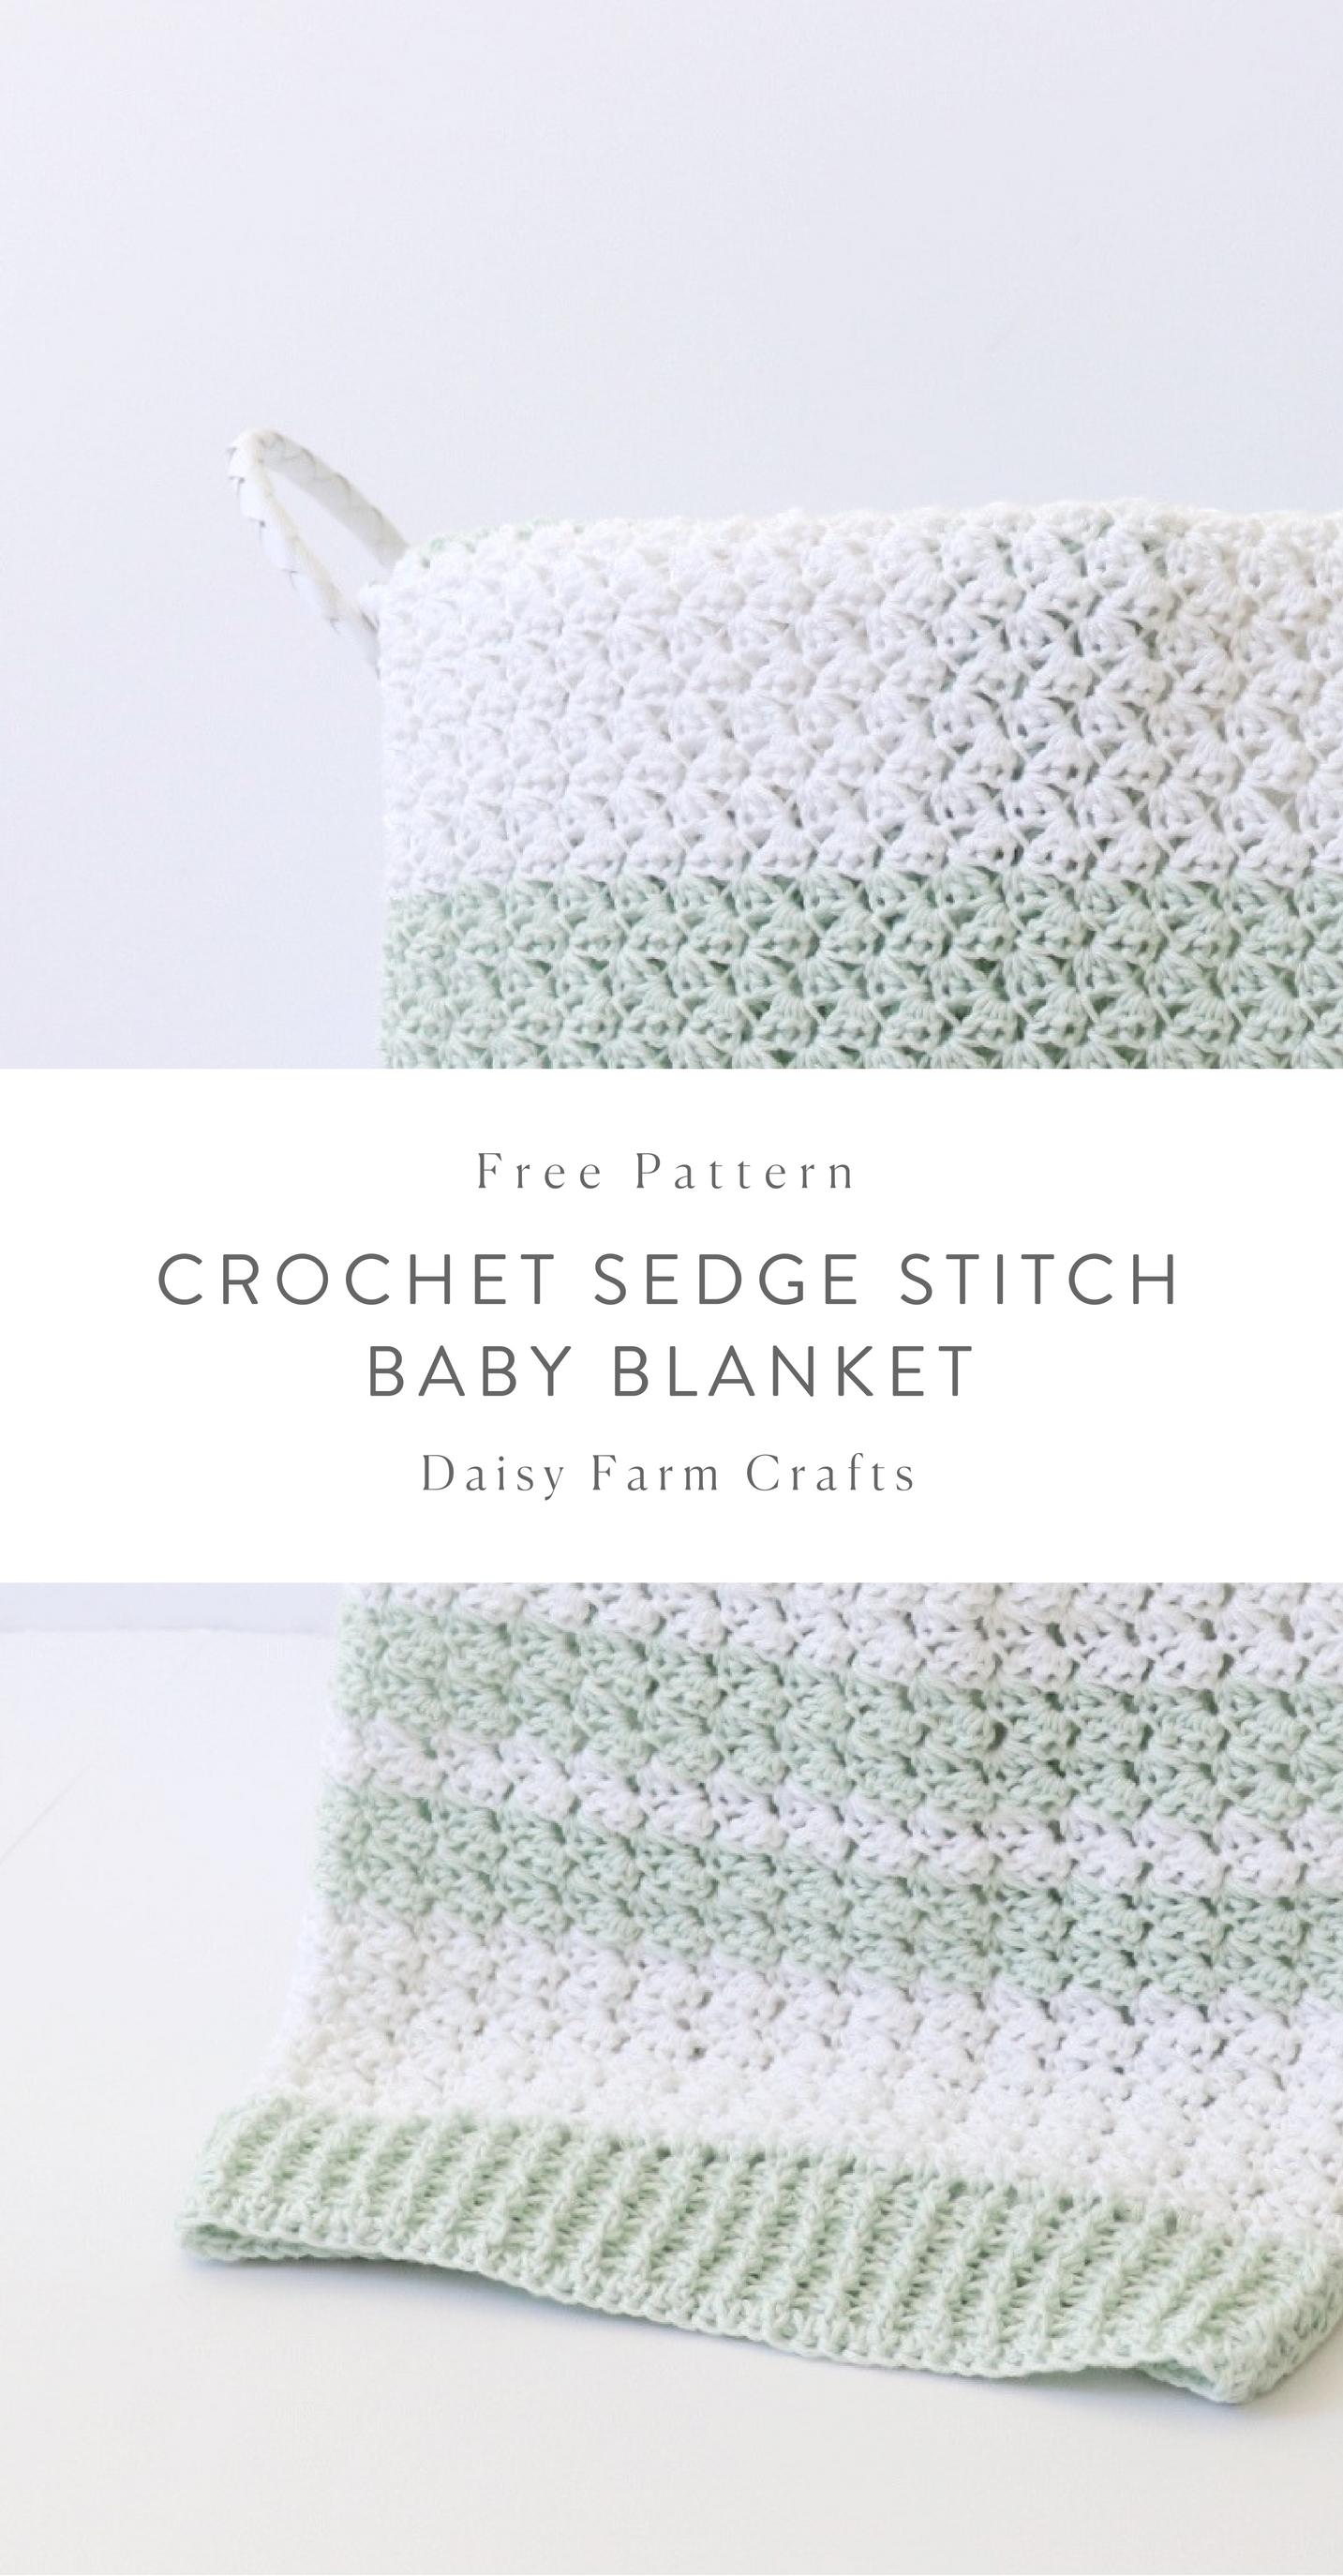 Free Pattern - Crochet Sedge Stitch Baby Blanket #crochet ...